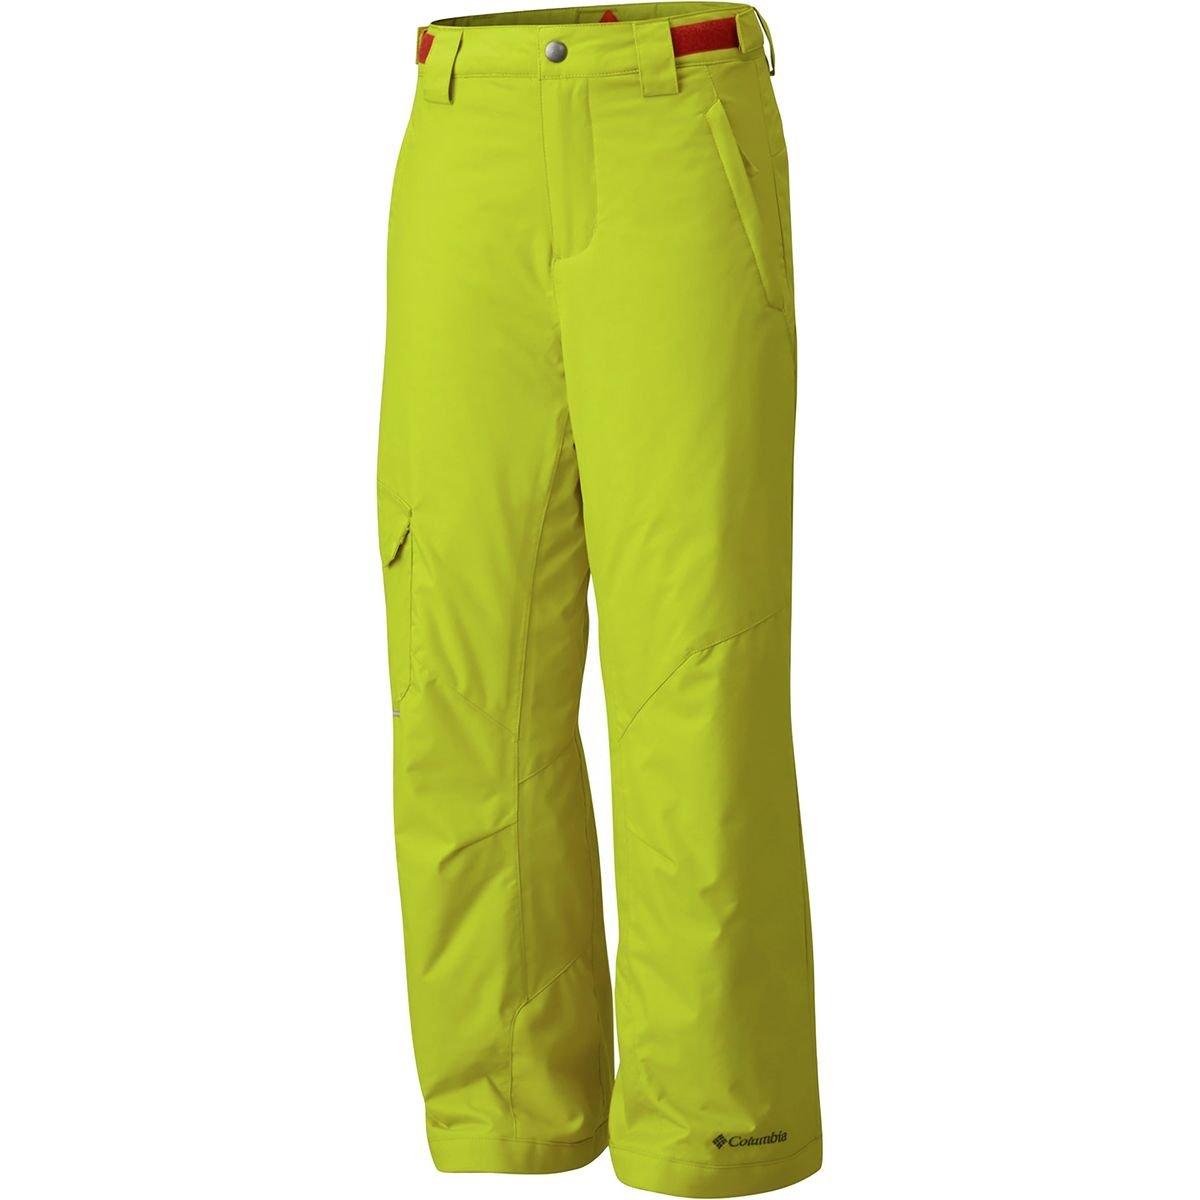 Columbia Bugaboo Pants, Ginkgo, X-Large